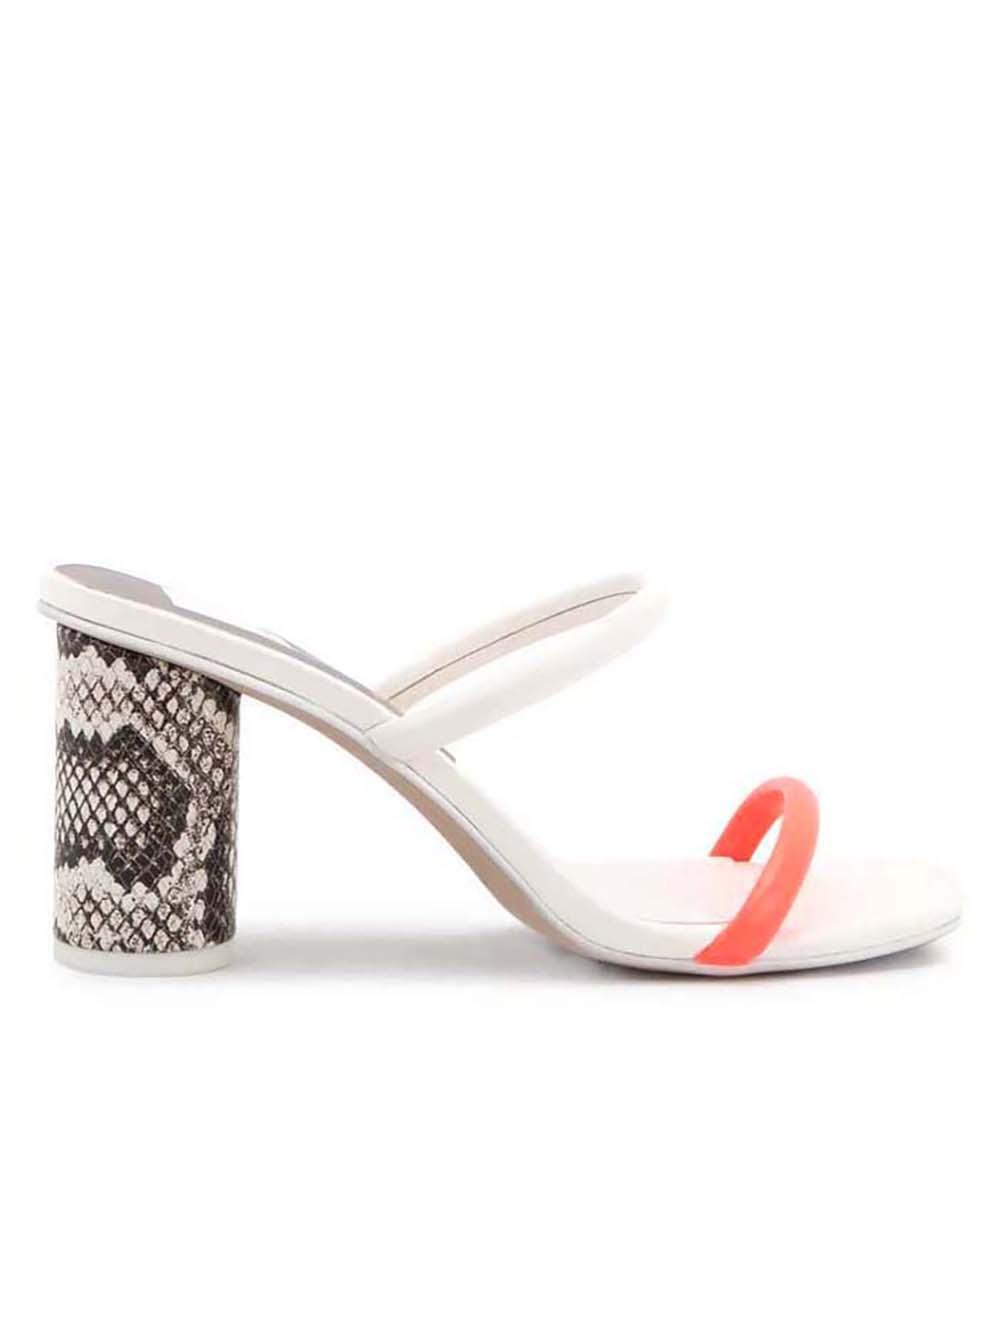 Noles Snake Print Heel Sandal Item # NOLES-S20